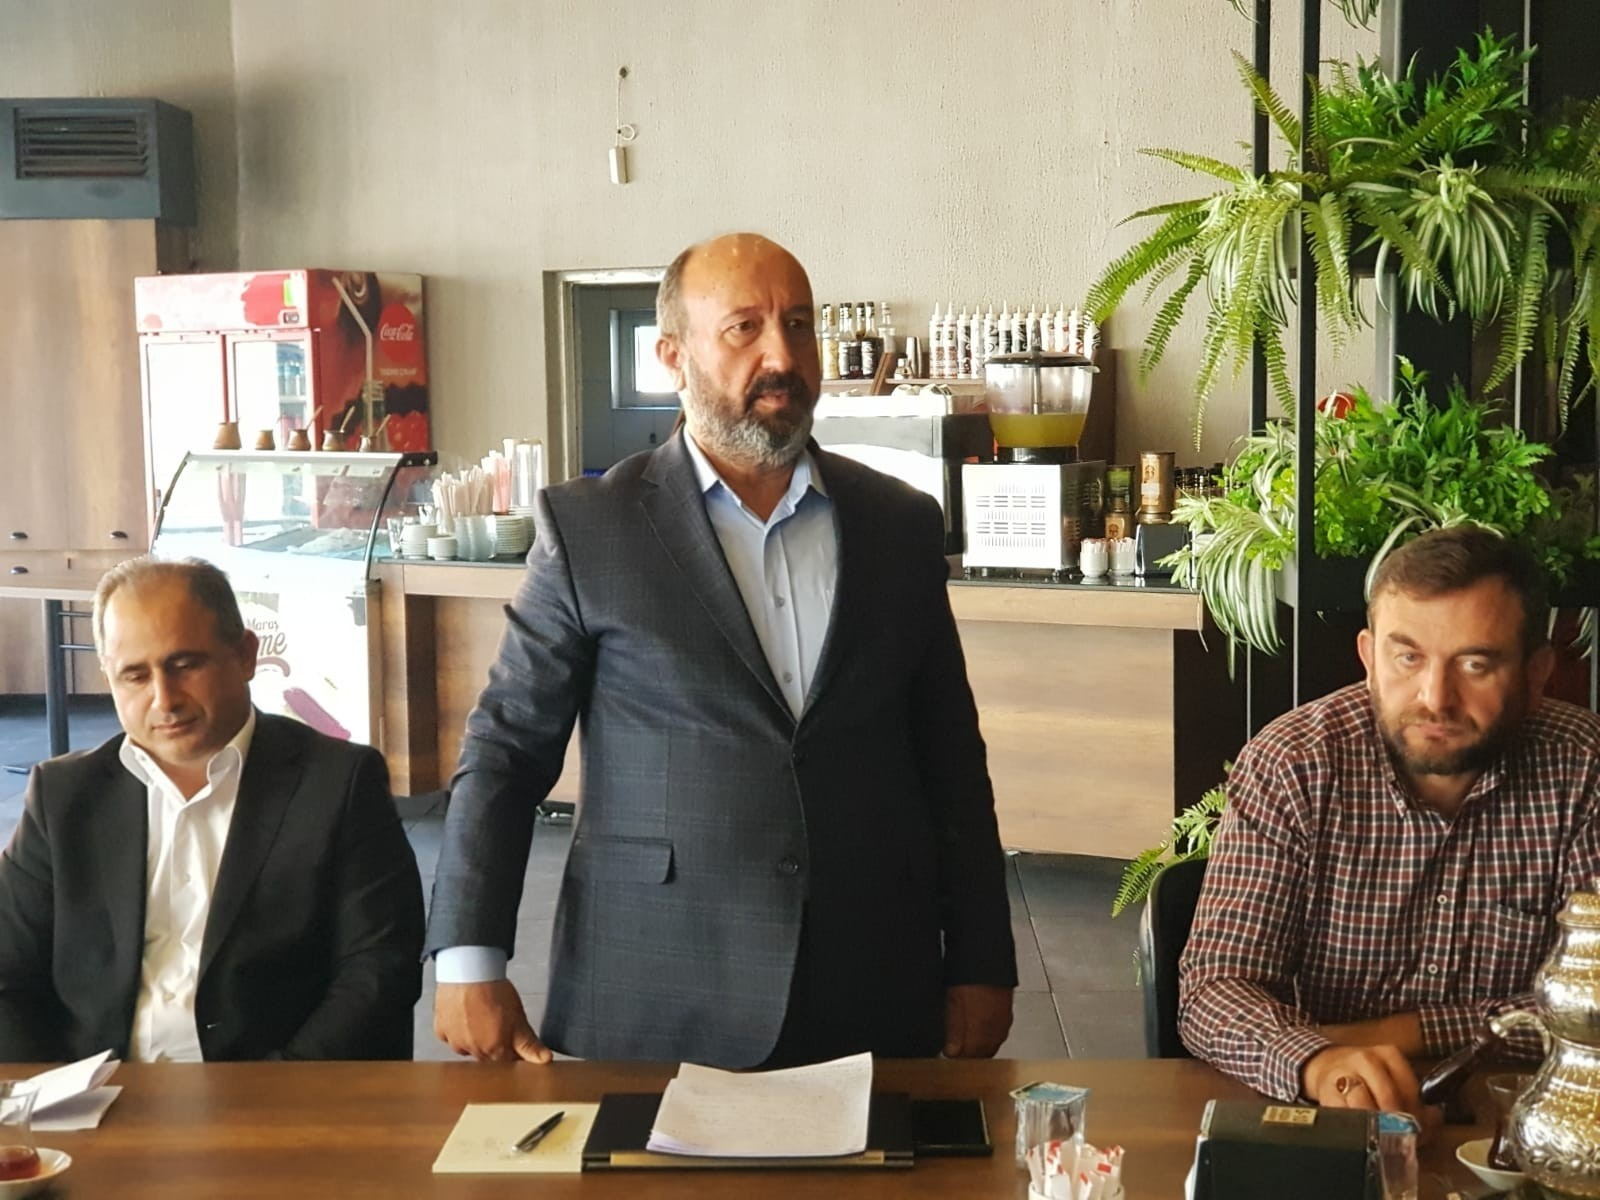 AK Parti Çorum Milletvekili Kavuncu, STK'larla buluştu #corum